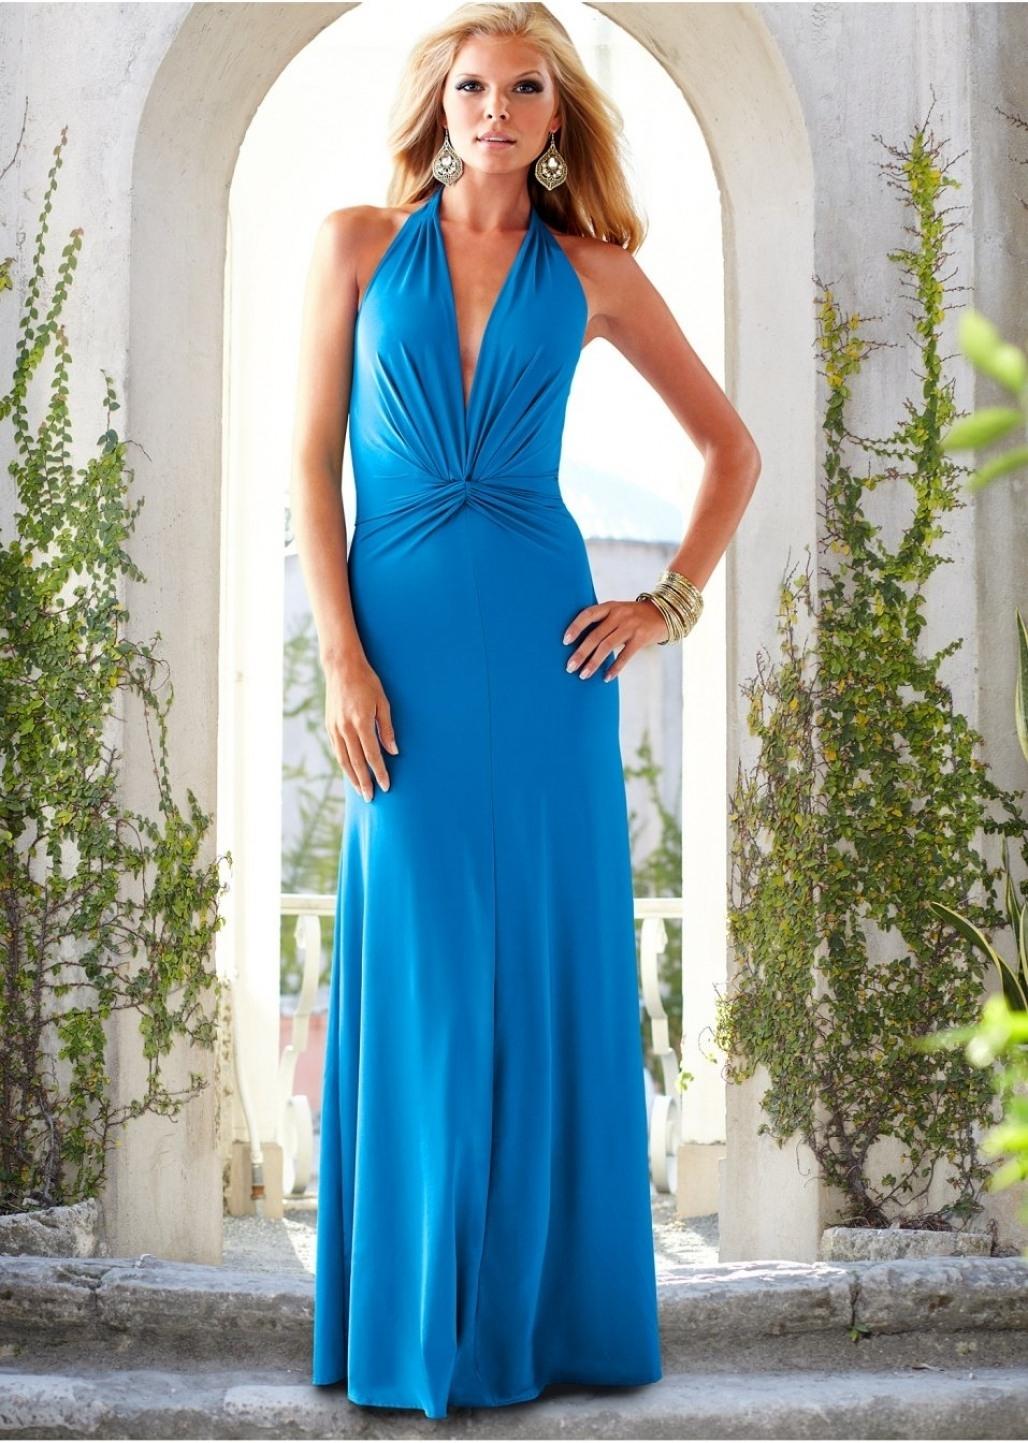 Abend Fantastisch Abendkleider Online Lang BoutiqueFormal Leicht Abendkleider Online Lang Vertrieb